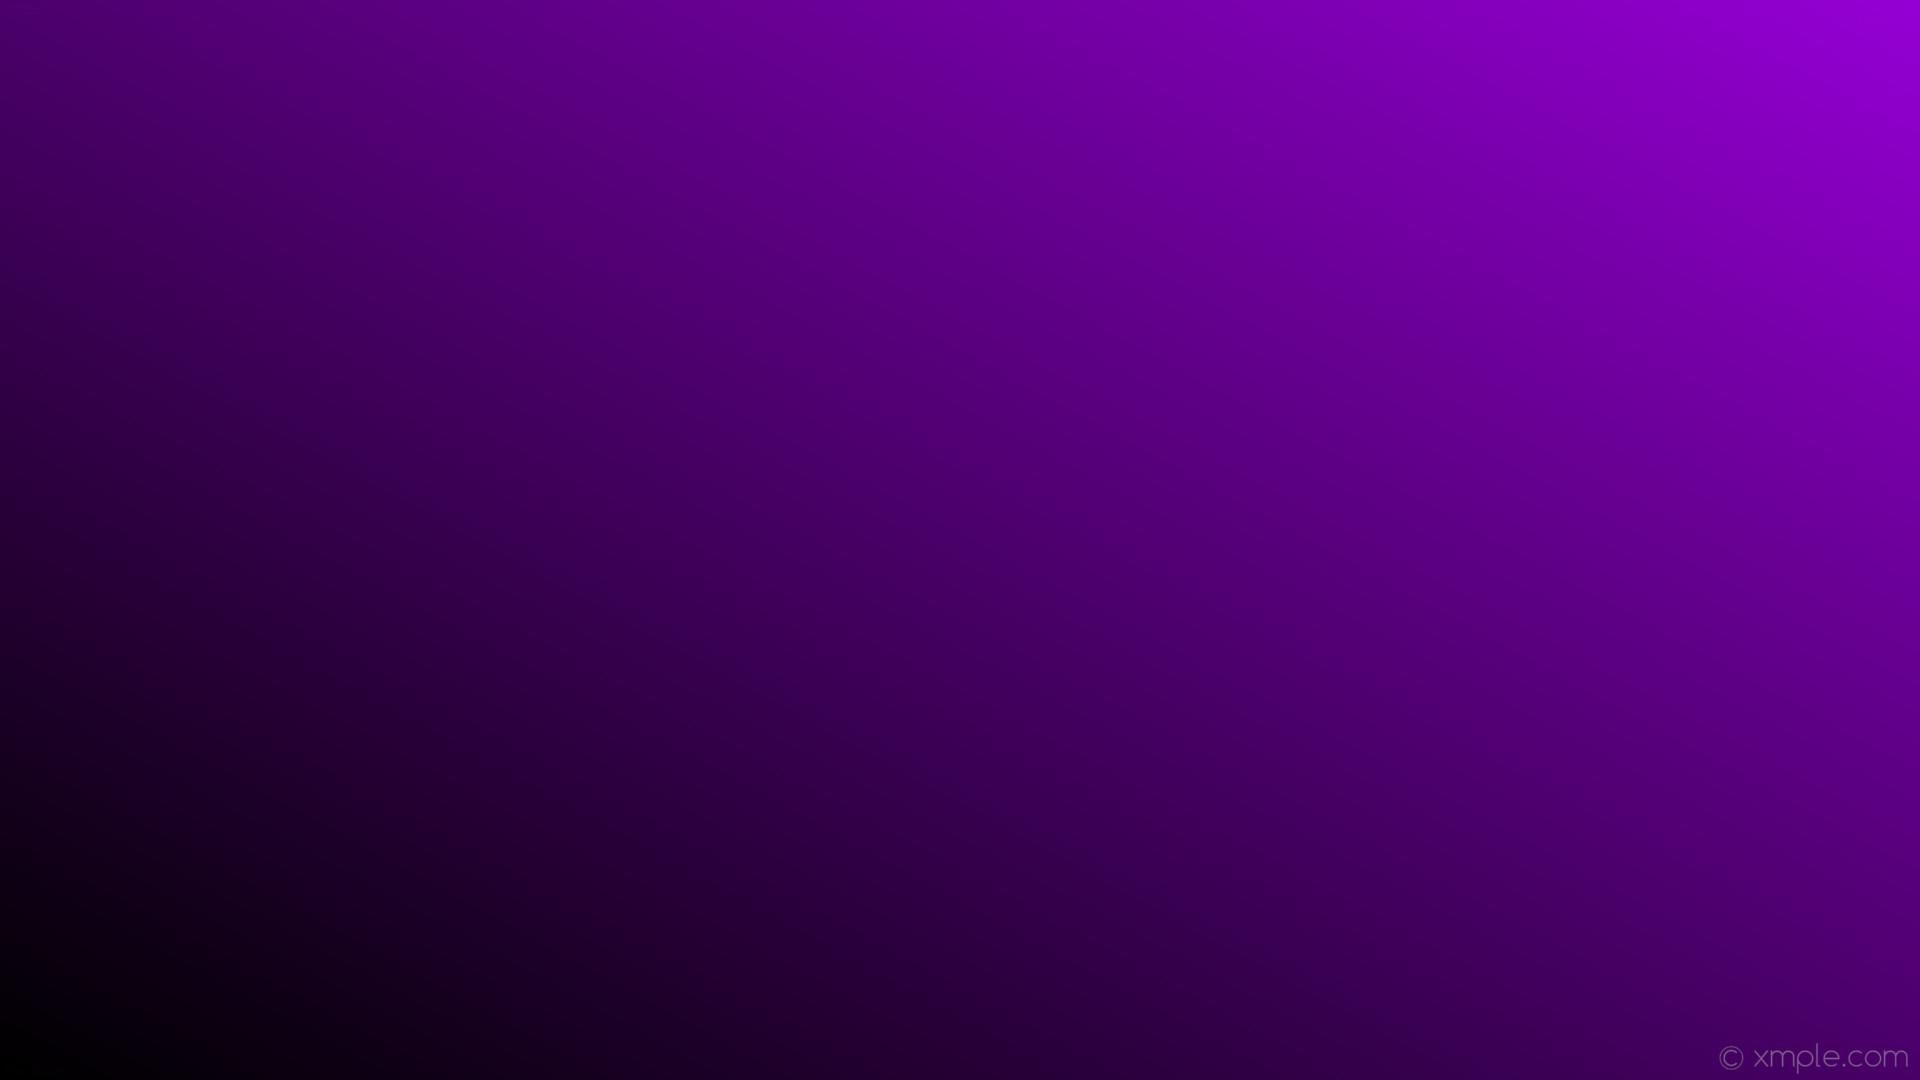 wallpaper purple black gradient linear dark violet #9400d3 #000000 30°